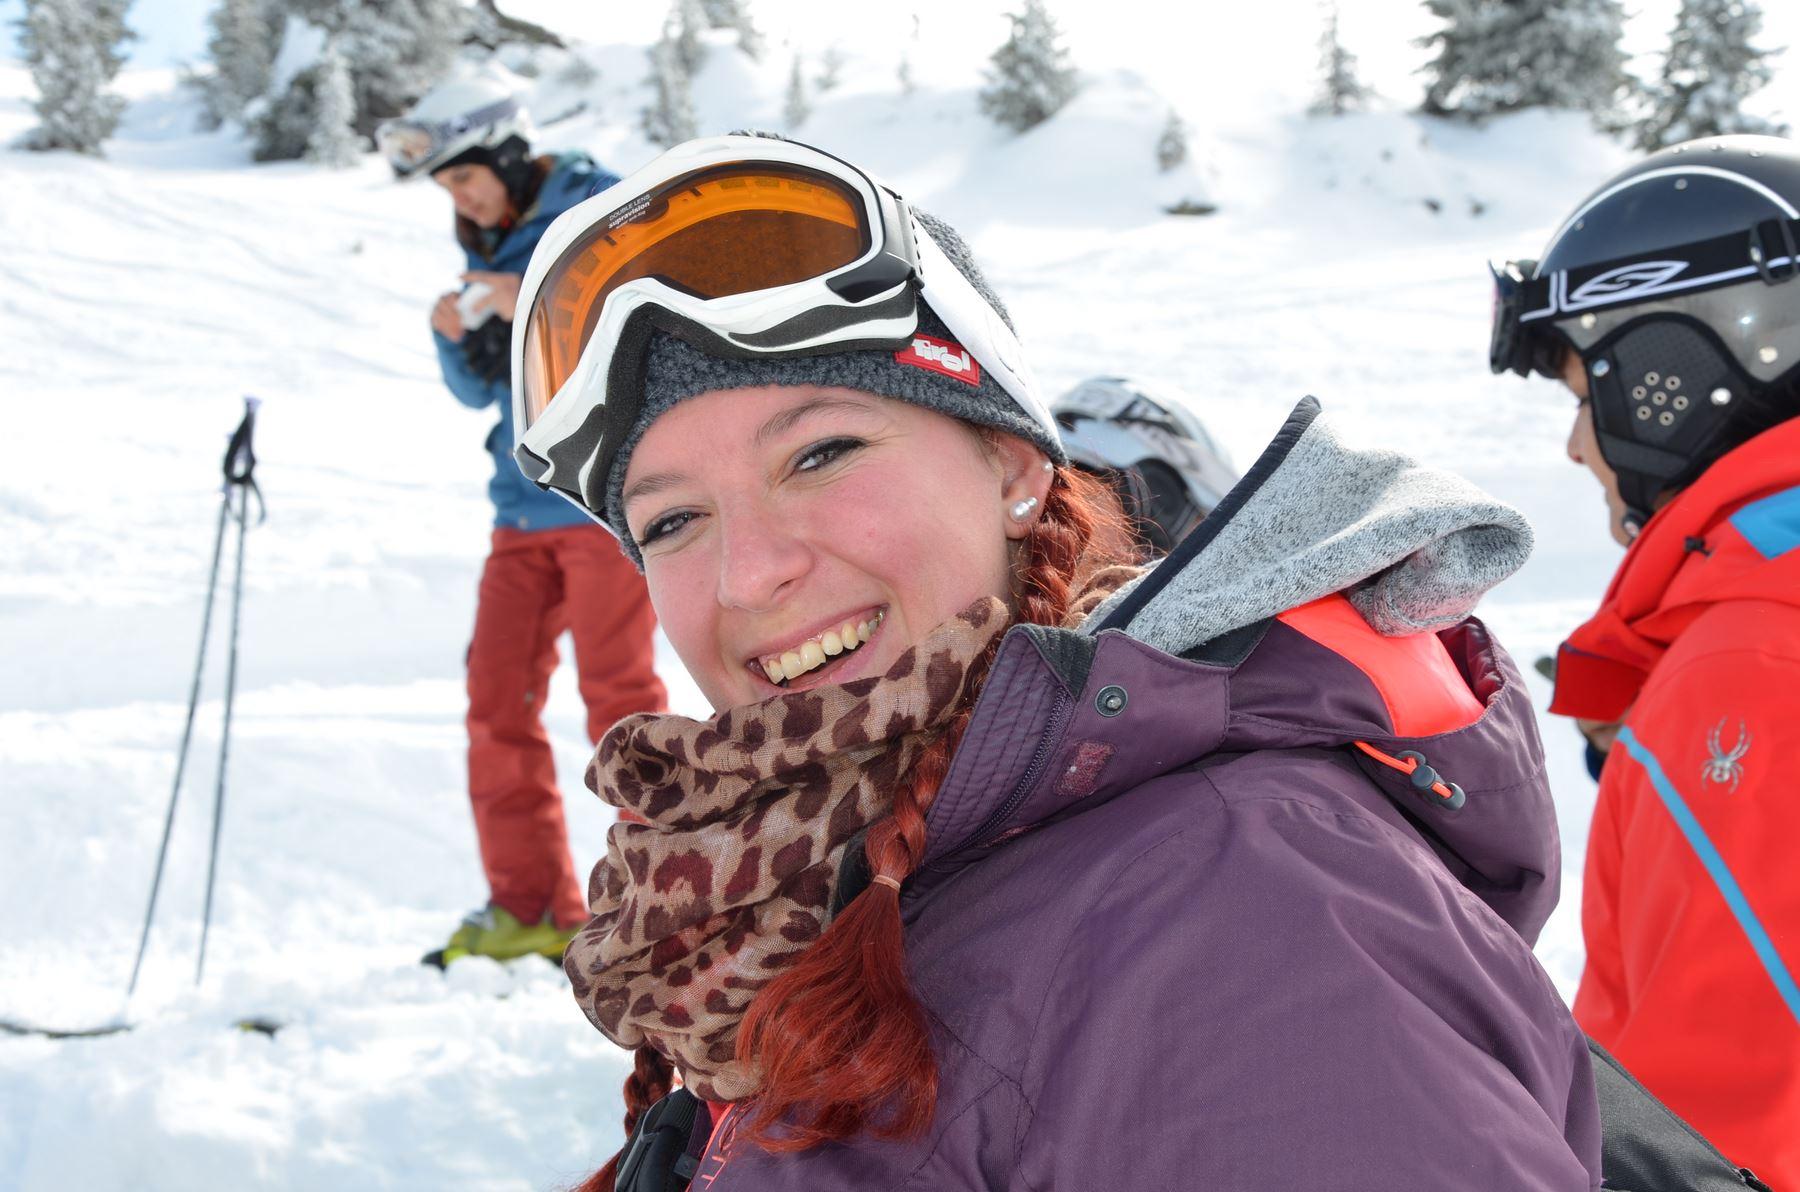 2015-03-22 BV Zillertal Skirennen 280.JPG